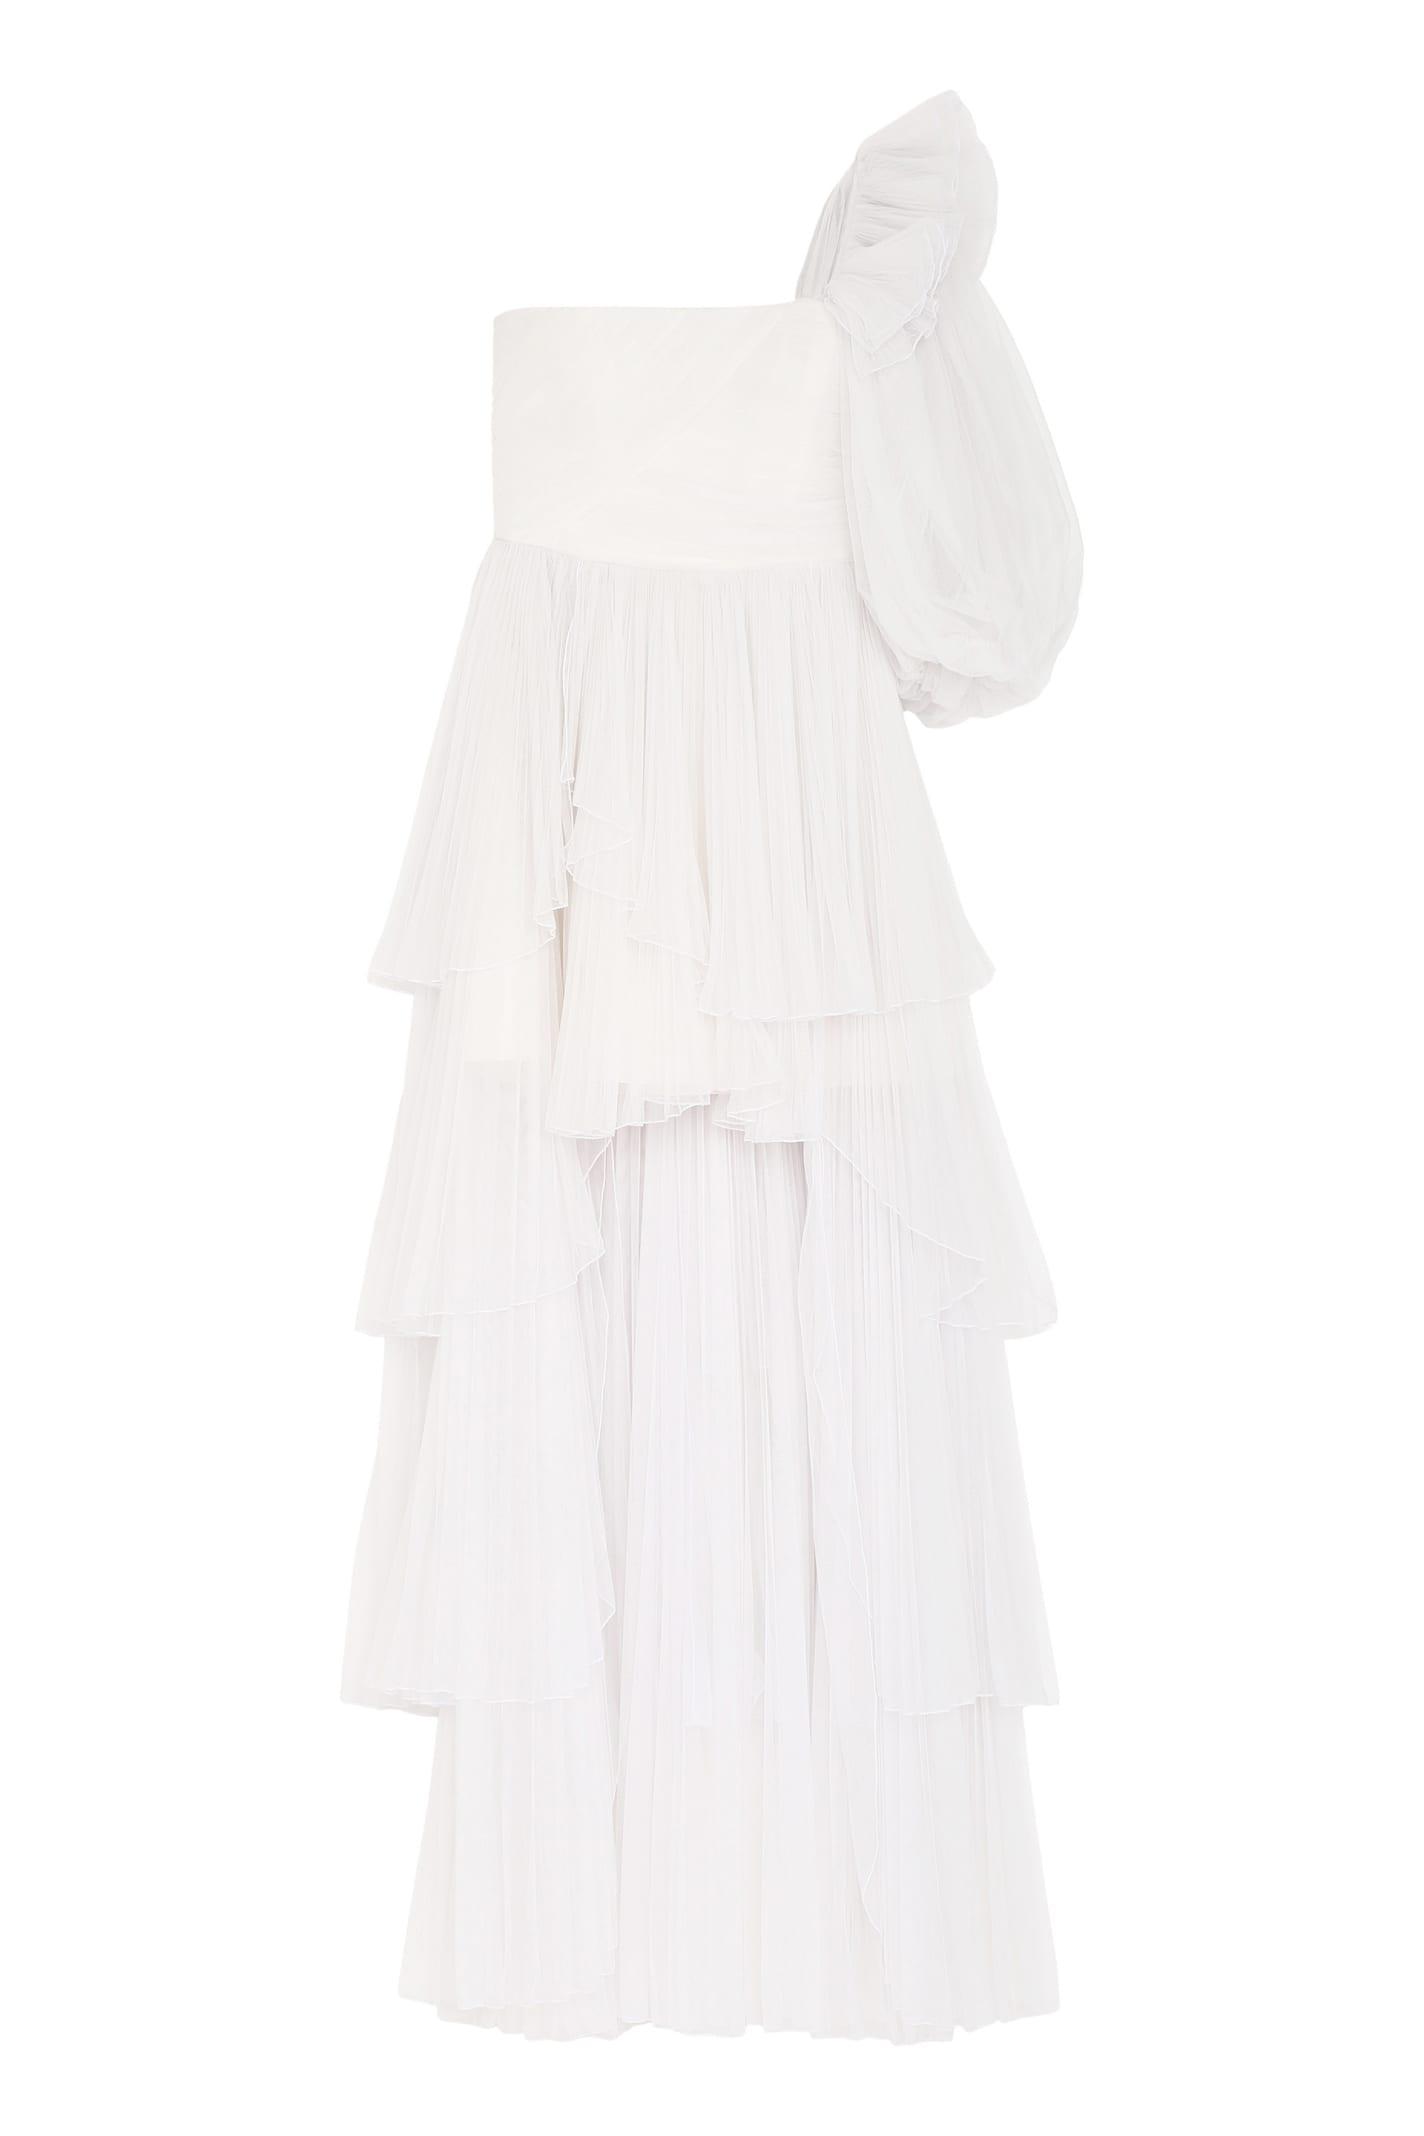 Alberta Ferretti Pleated Tulle Dress